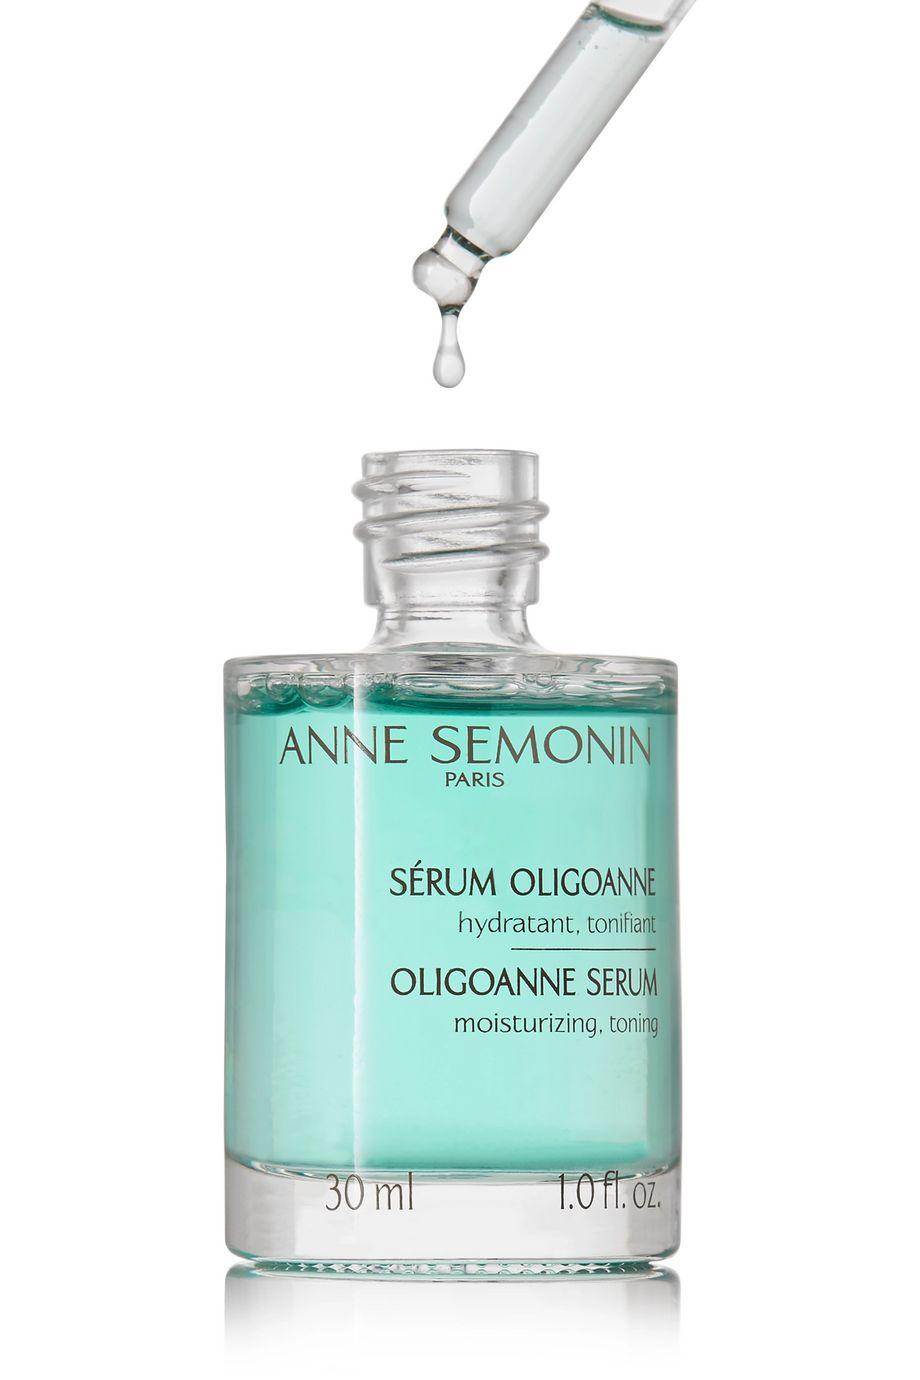 Anne Semonin Oligoanne Serum, 30ml